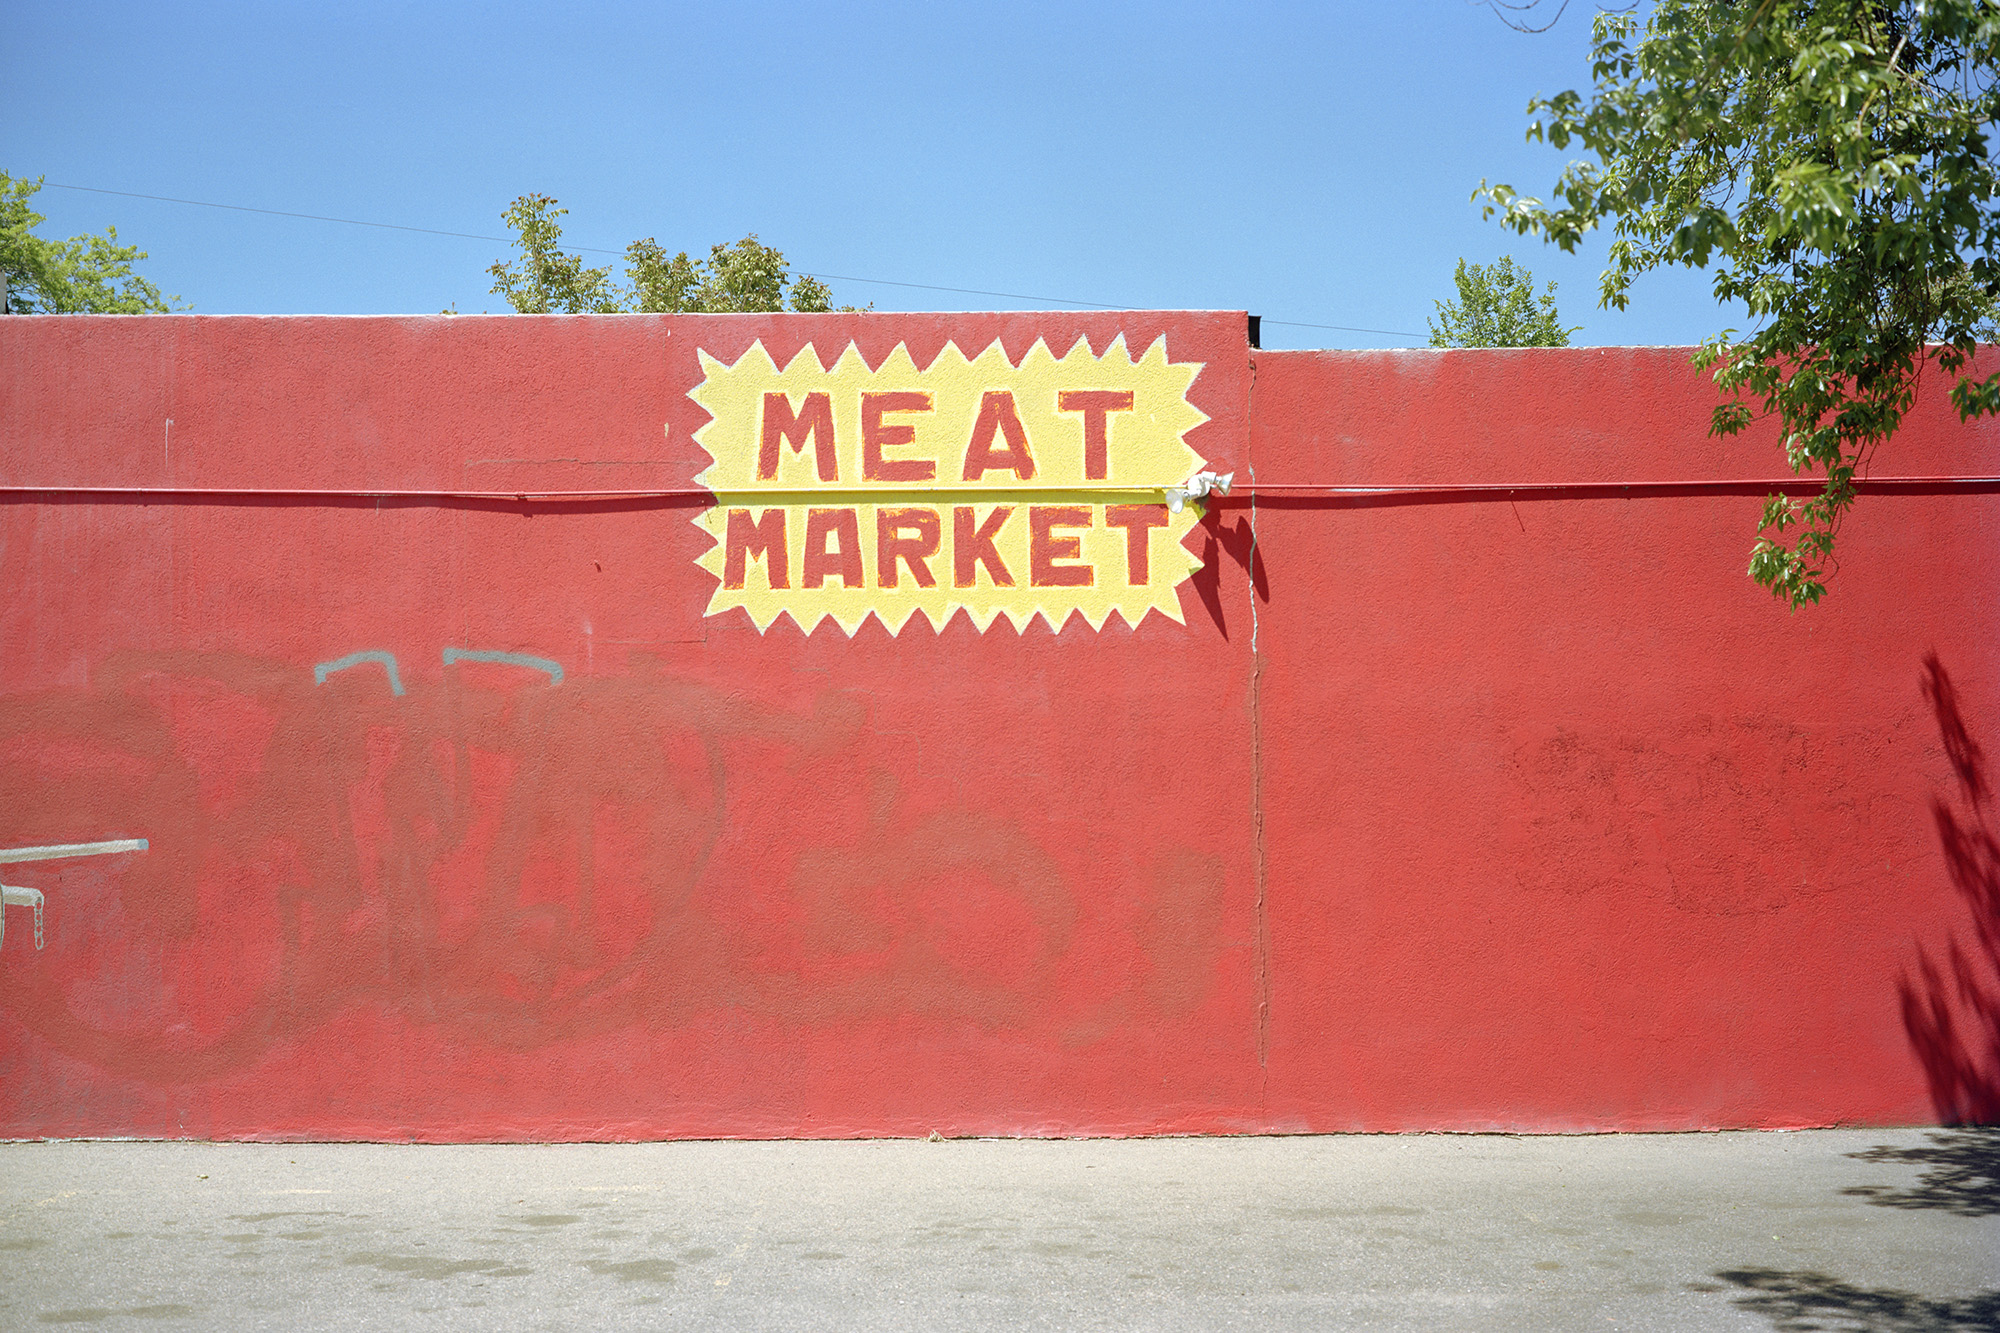 Meat Market, Arvada, CO.